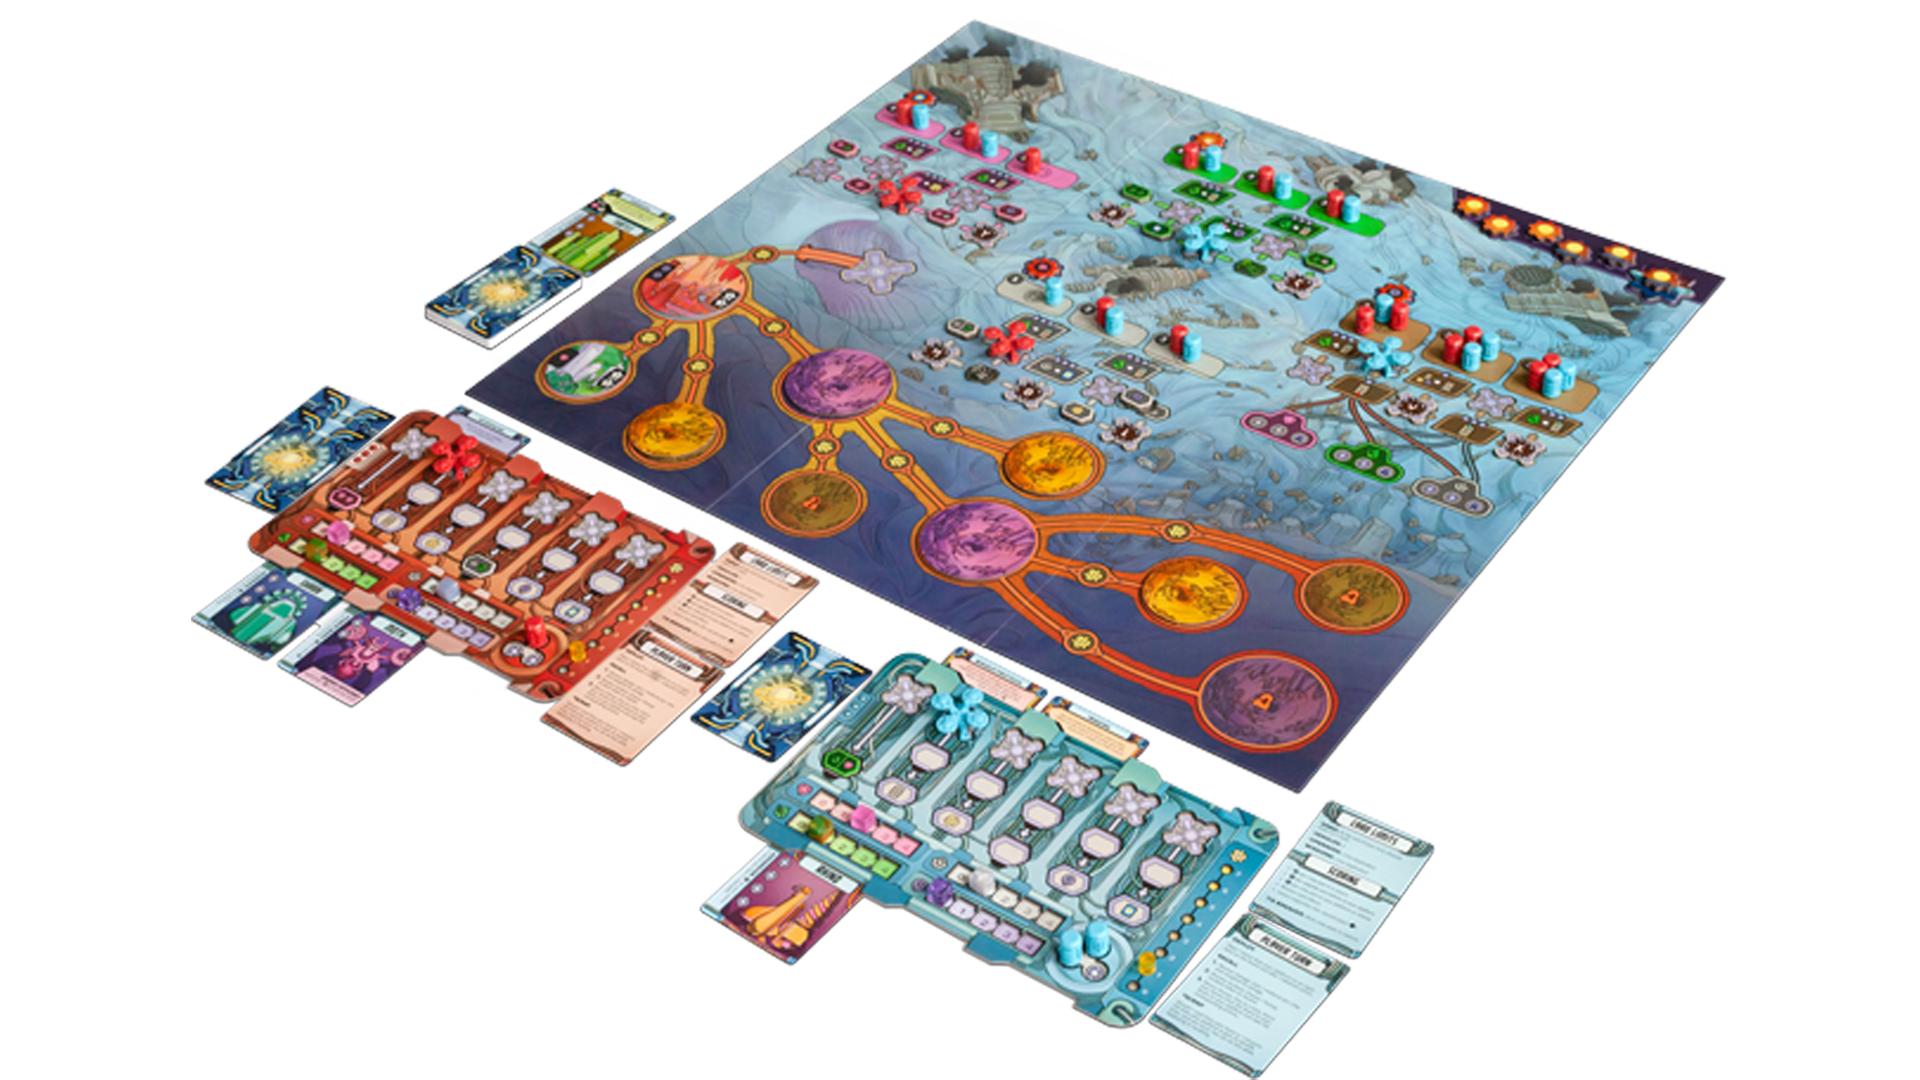 Cyro board game layout